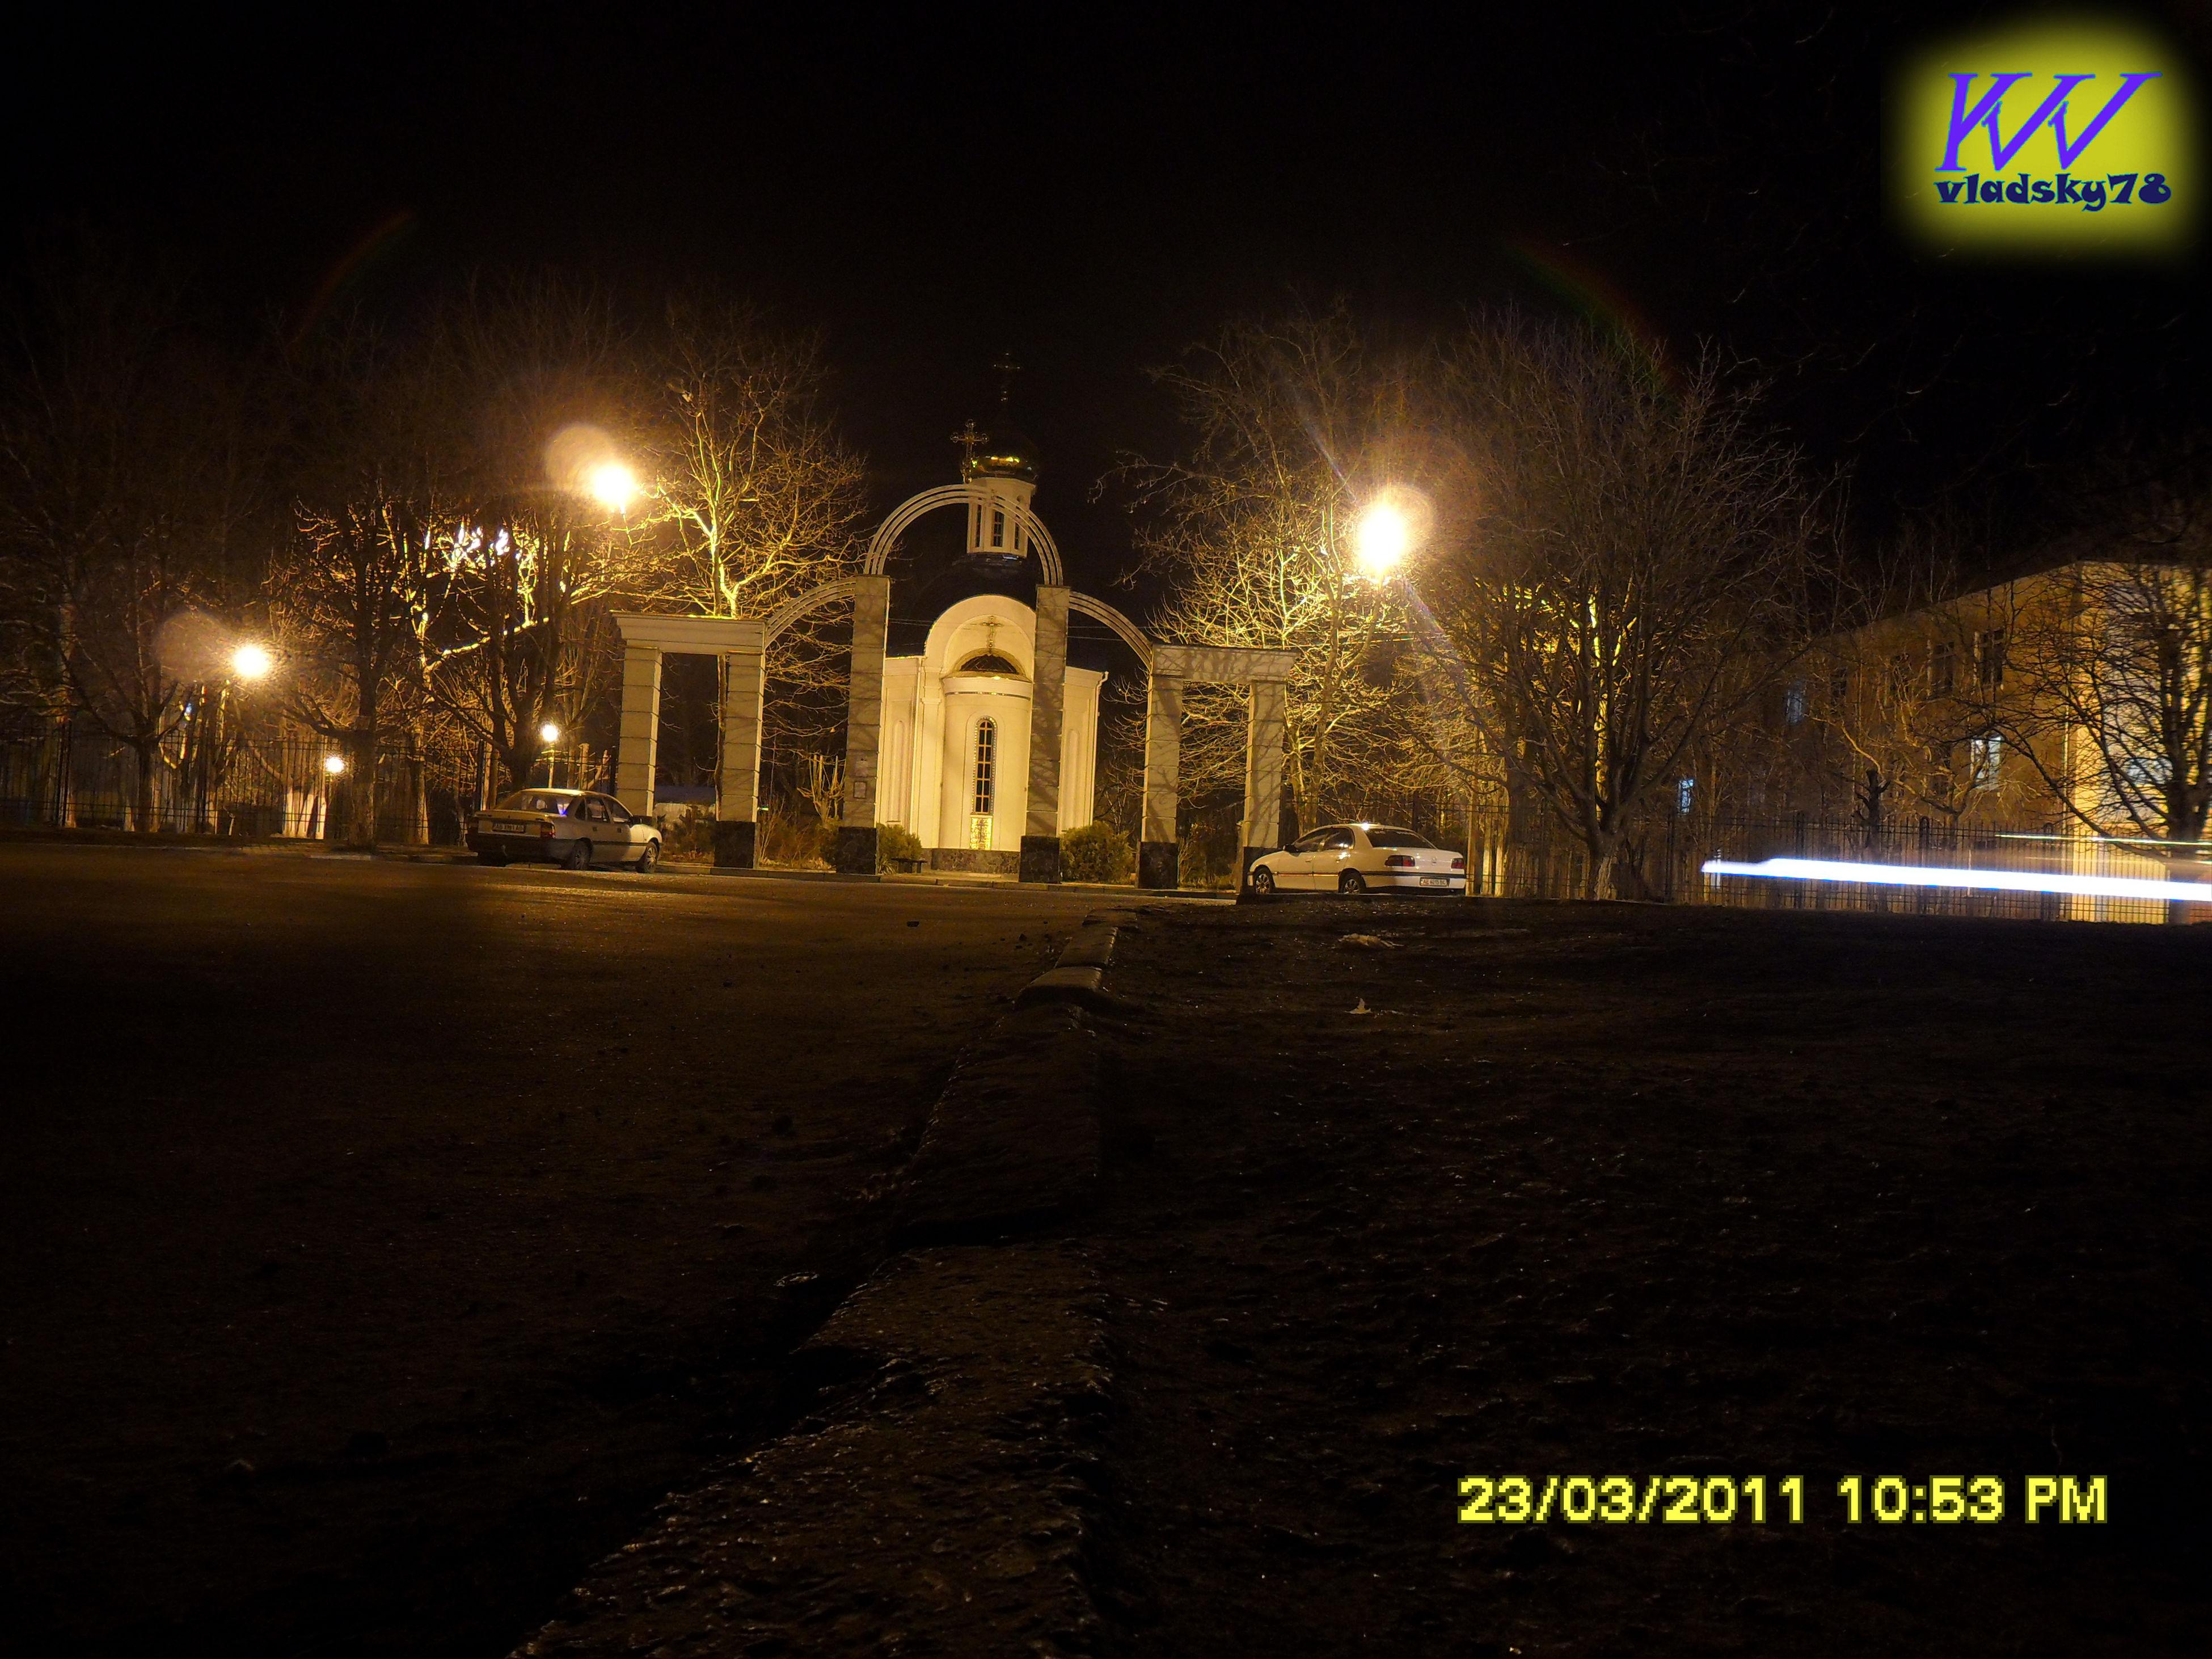 night, illuminated, text, no people, outdoors, architecture